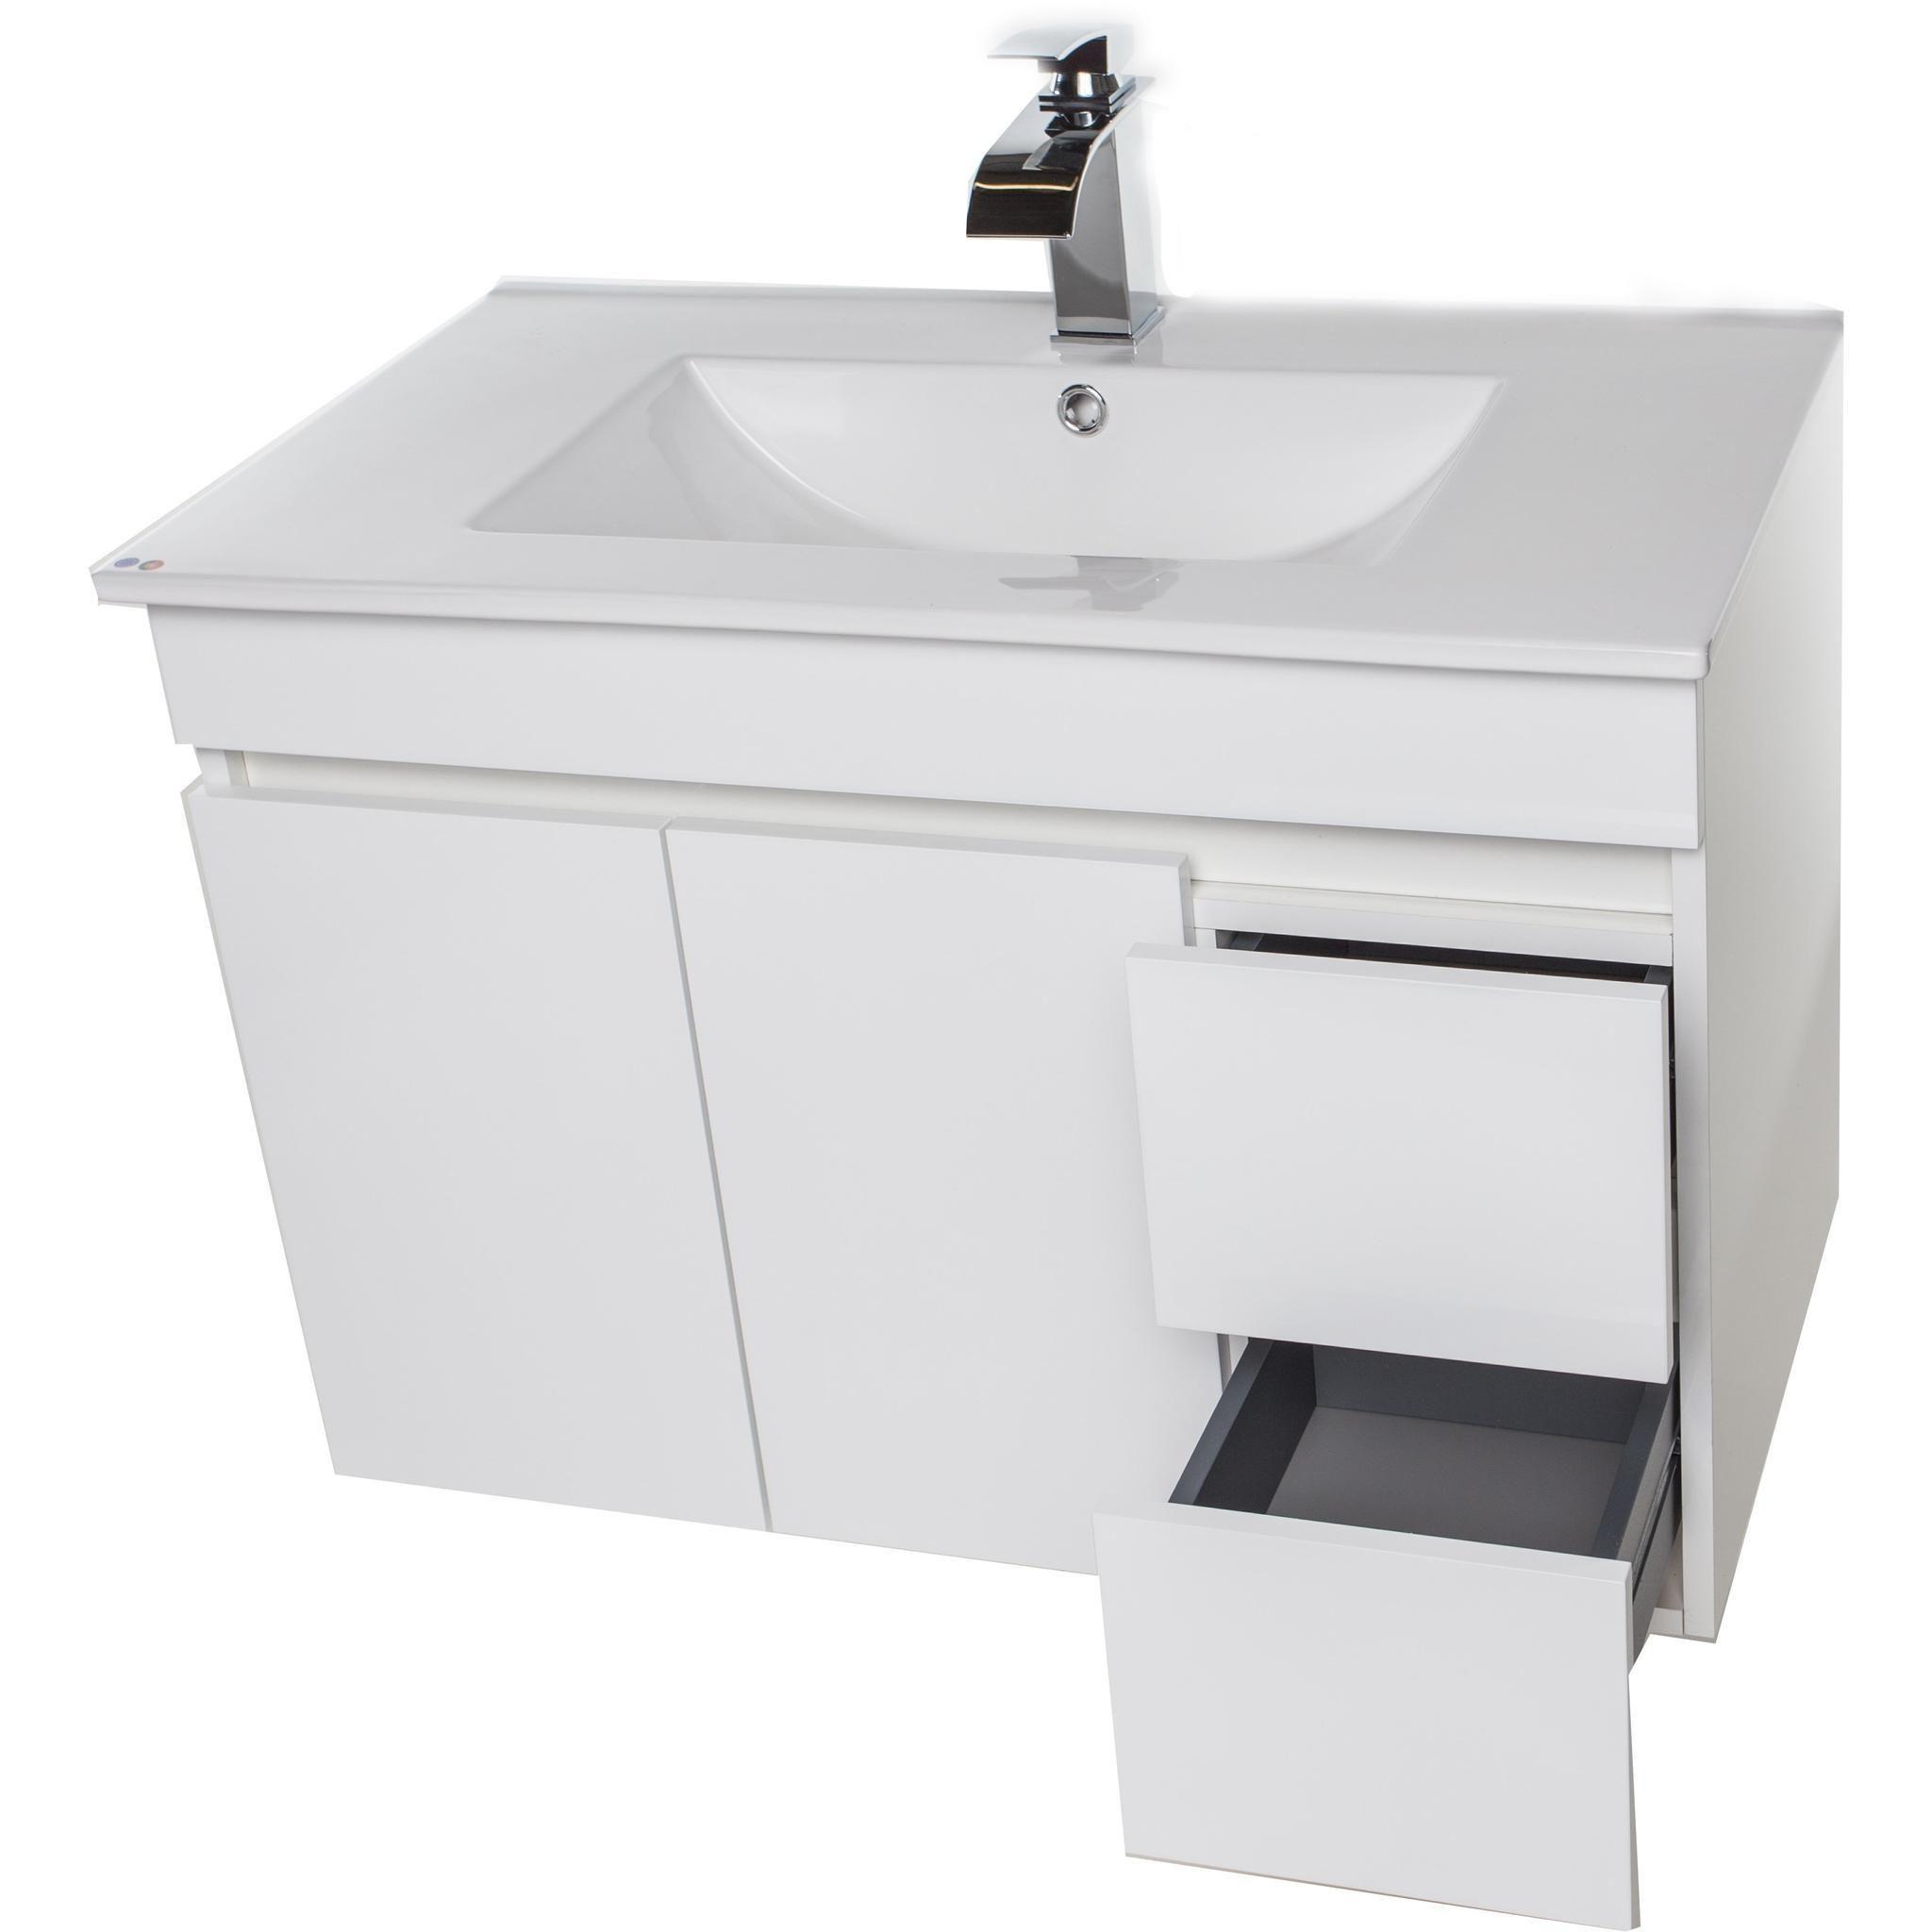 Strato 32 40 Wall Bathroom Vanity Cabinet Set Bath Furniture